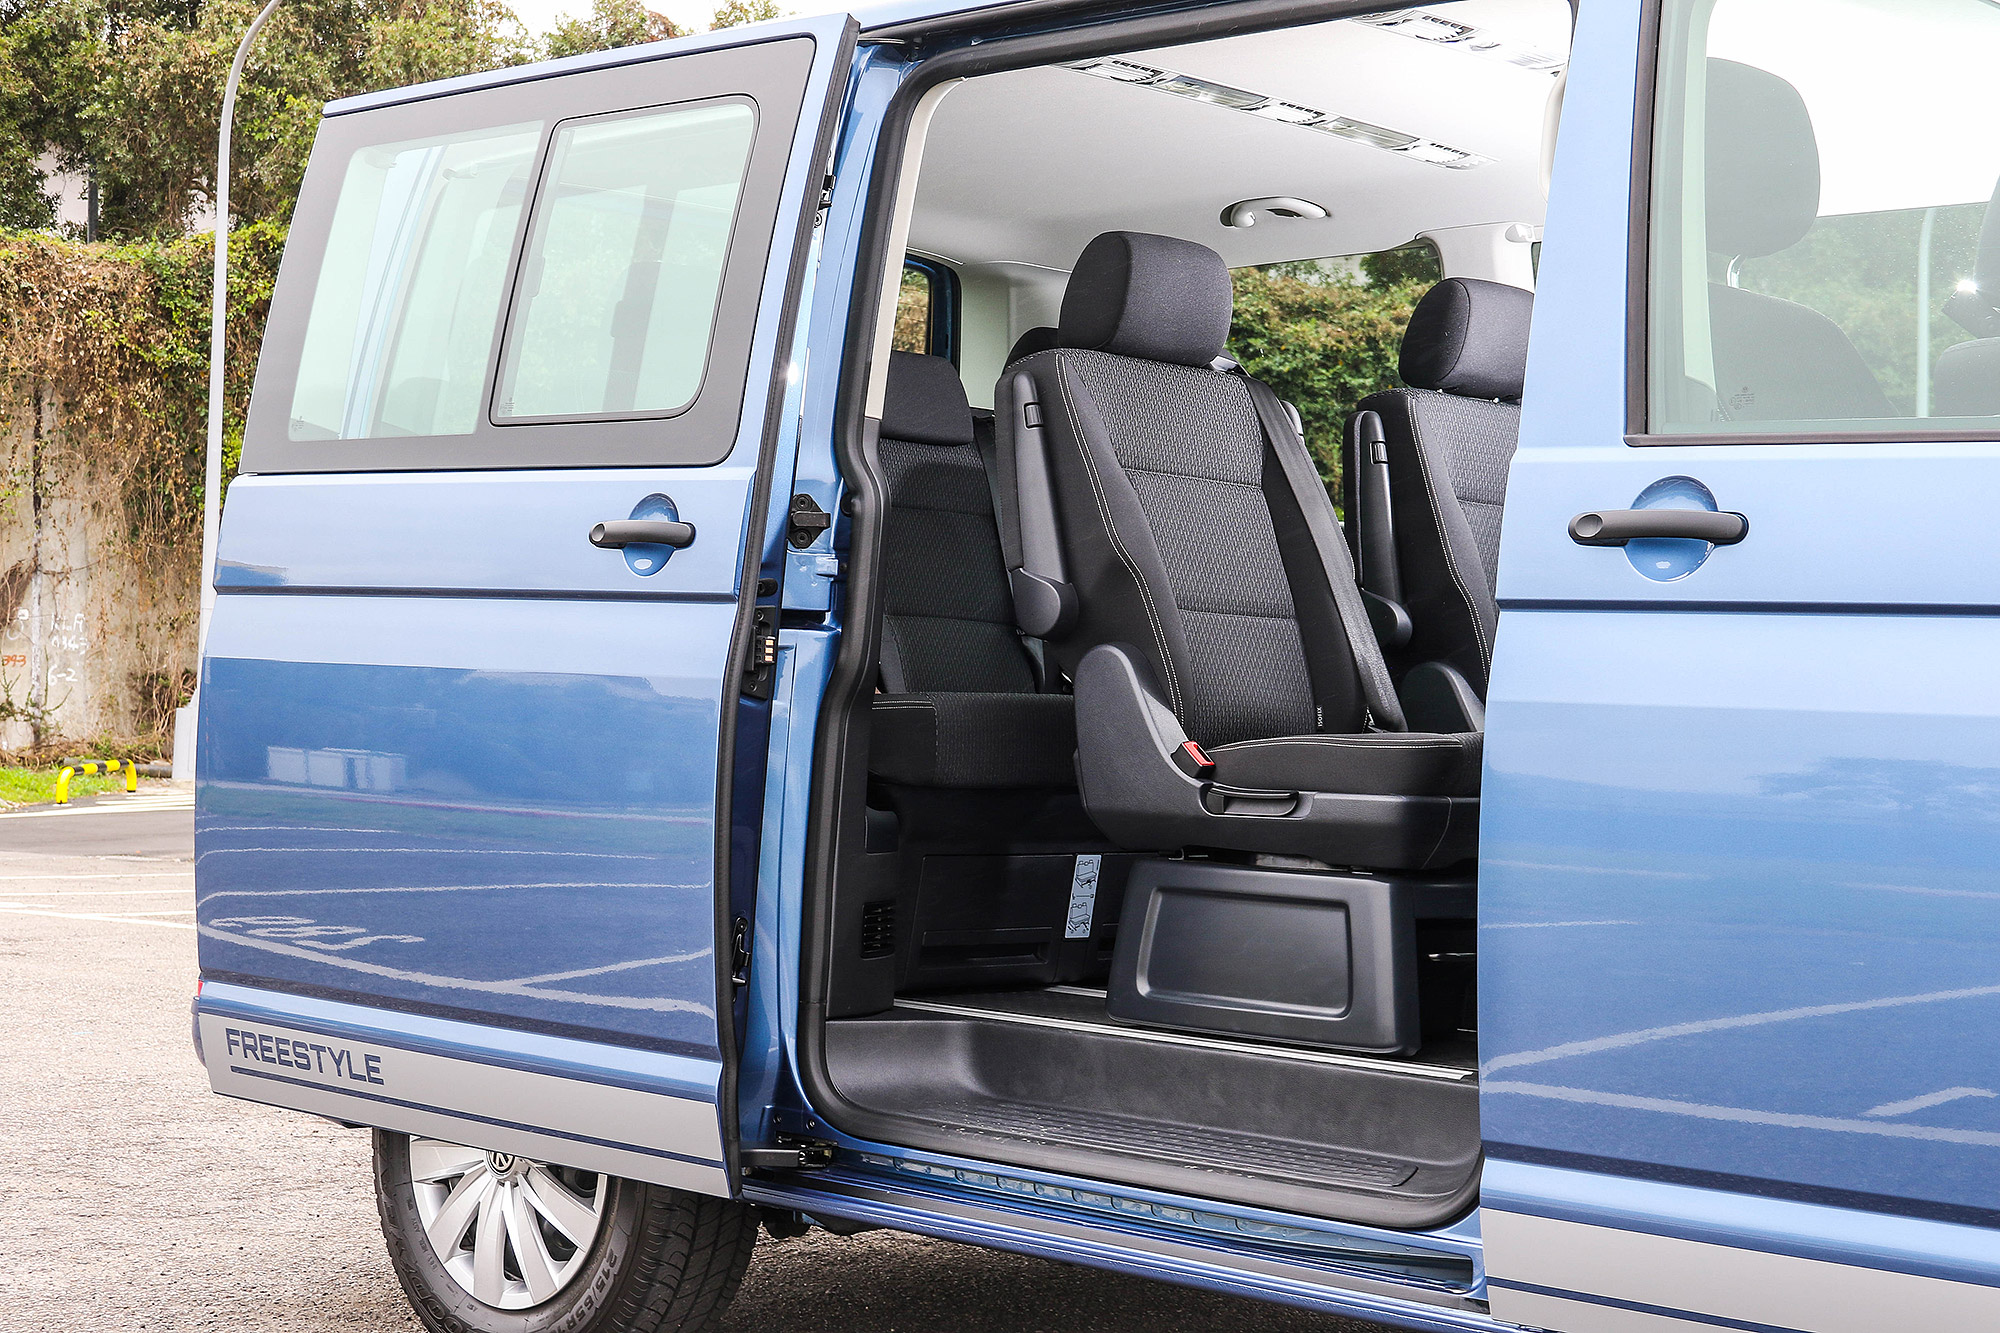 Freestyle 選用了與 Multivan 相同的座椅規劃。